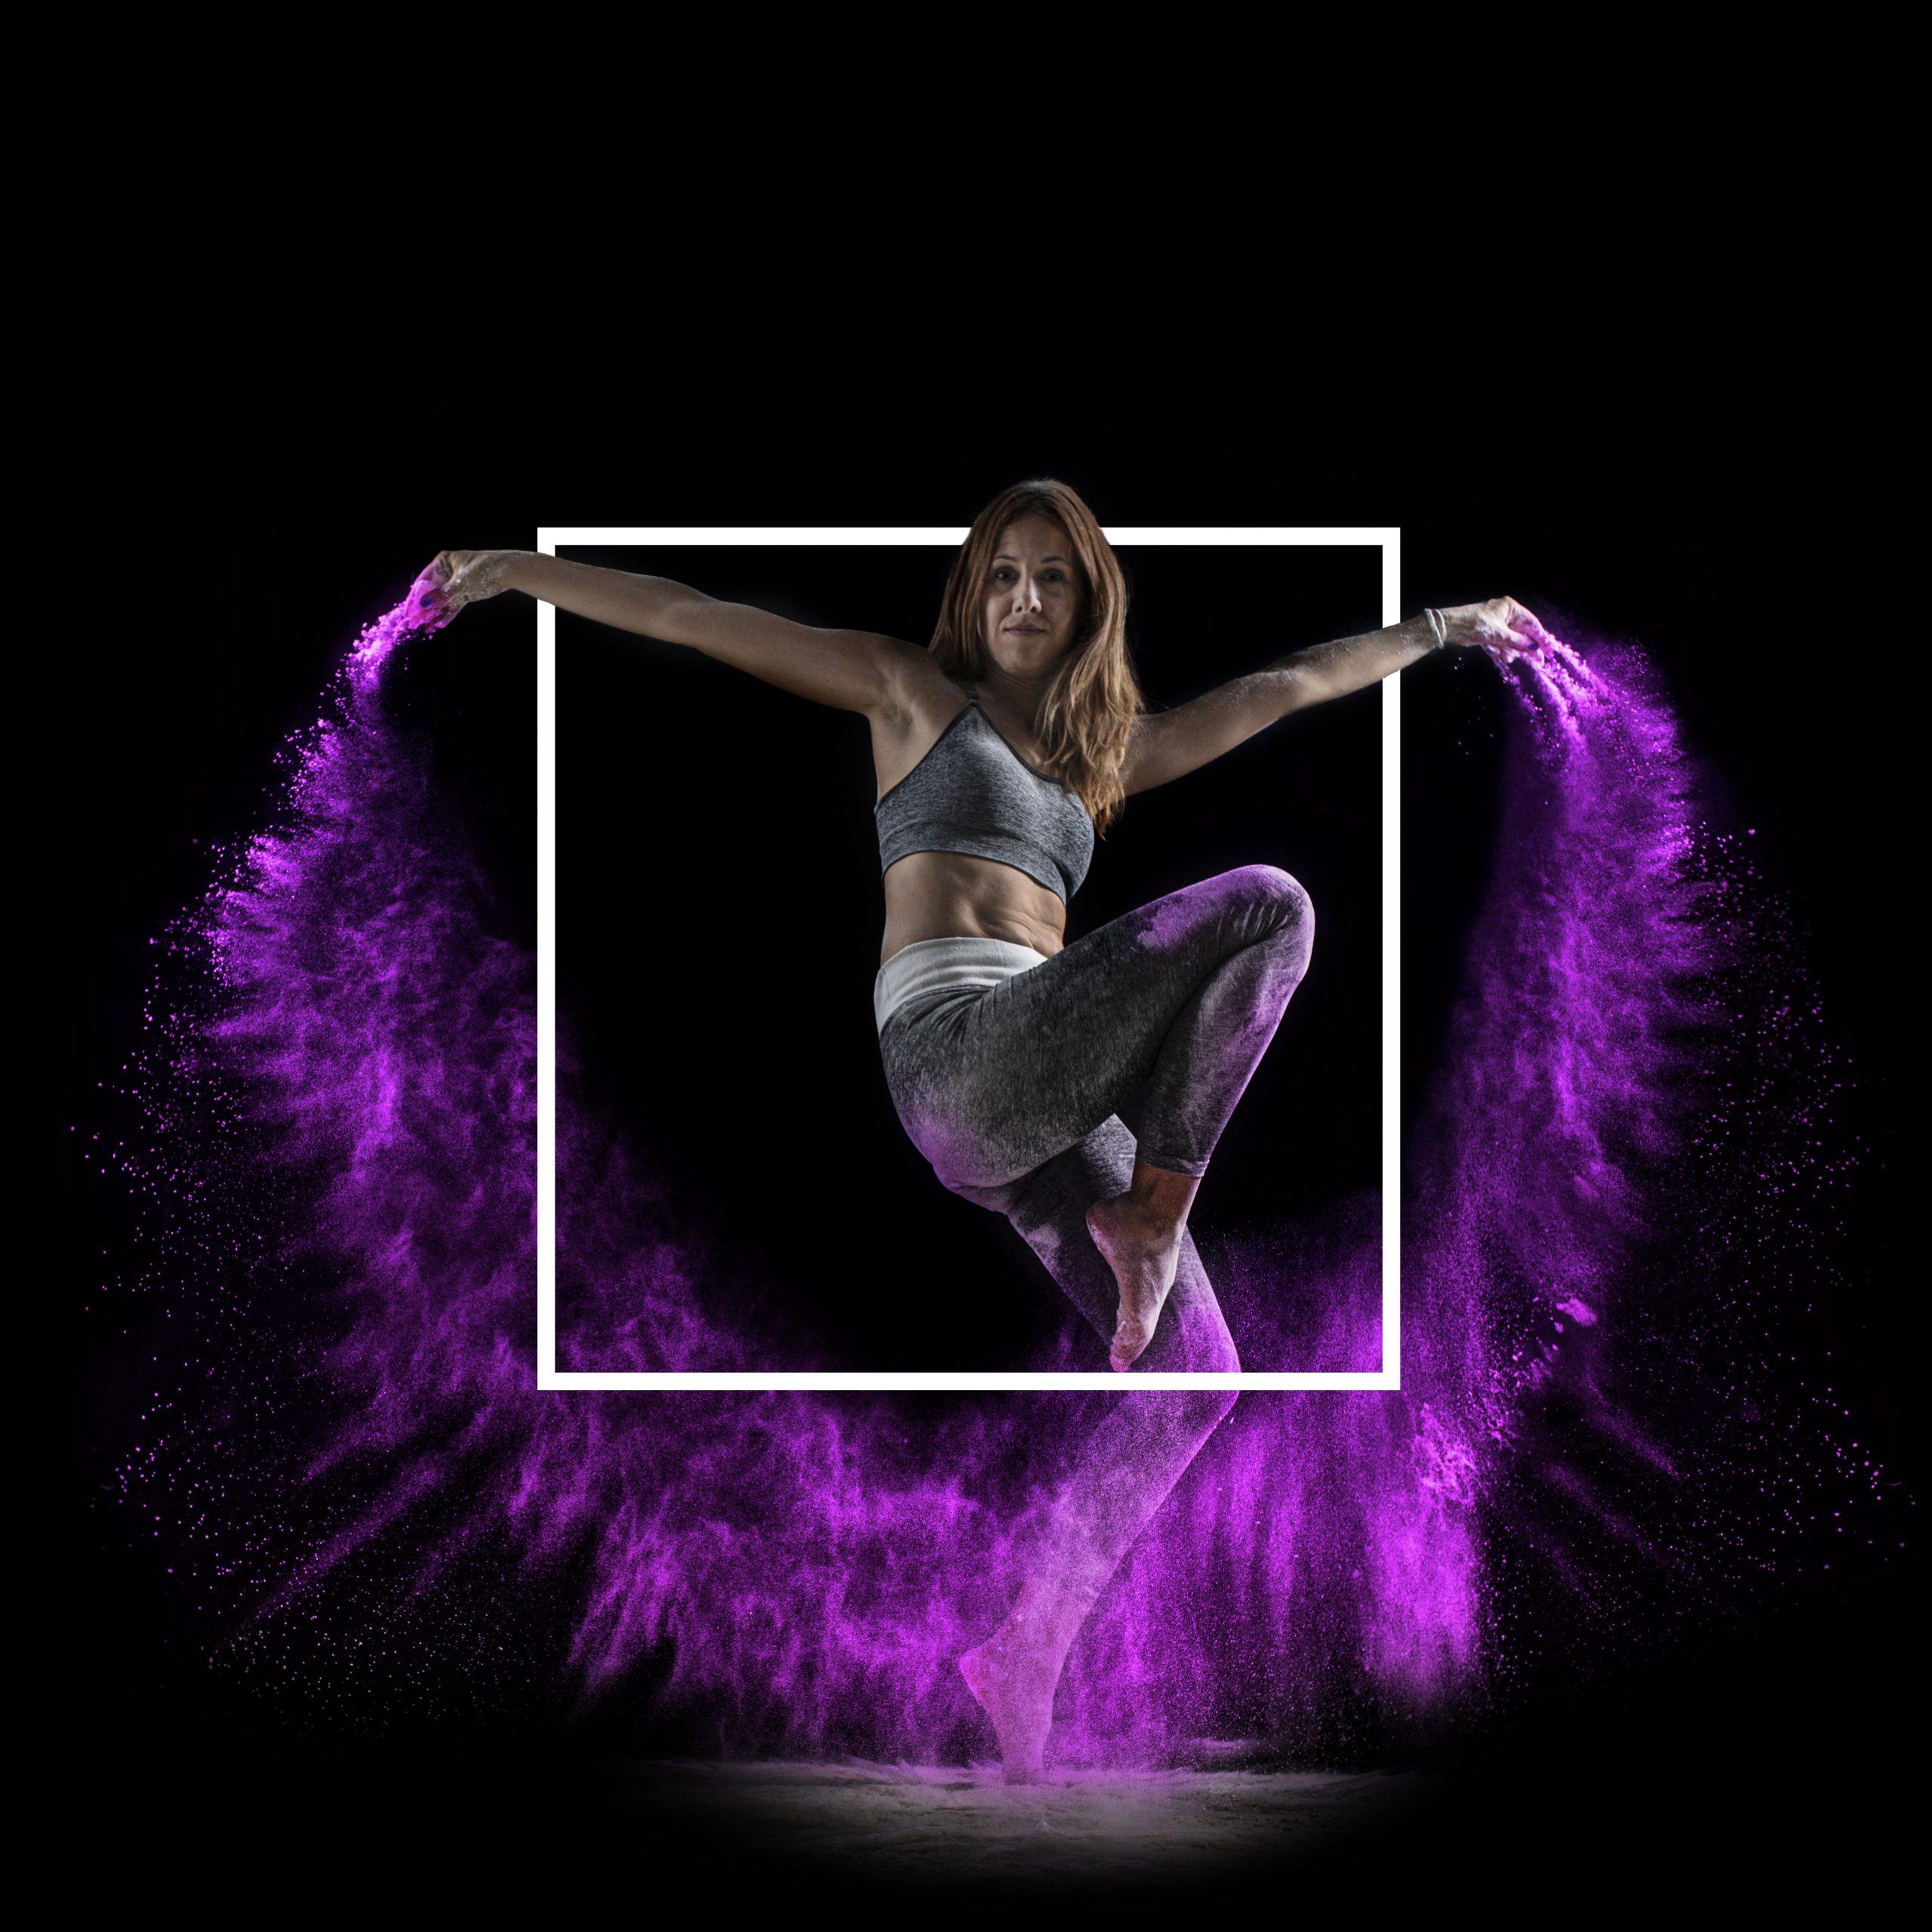 Szkoła Tańca Biała Podlaska Jazz Modern Balet Show Dance Salsa Bachata Latino High Heels